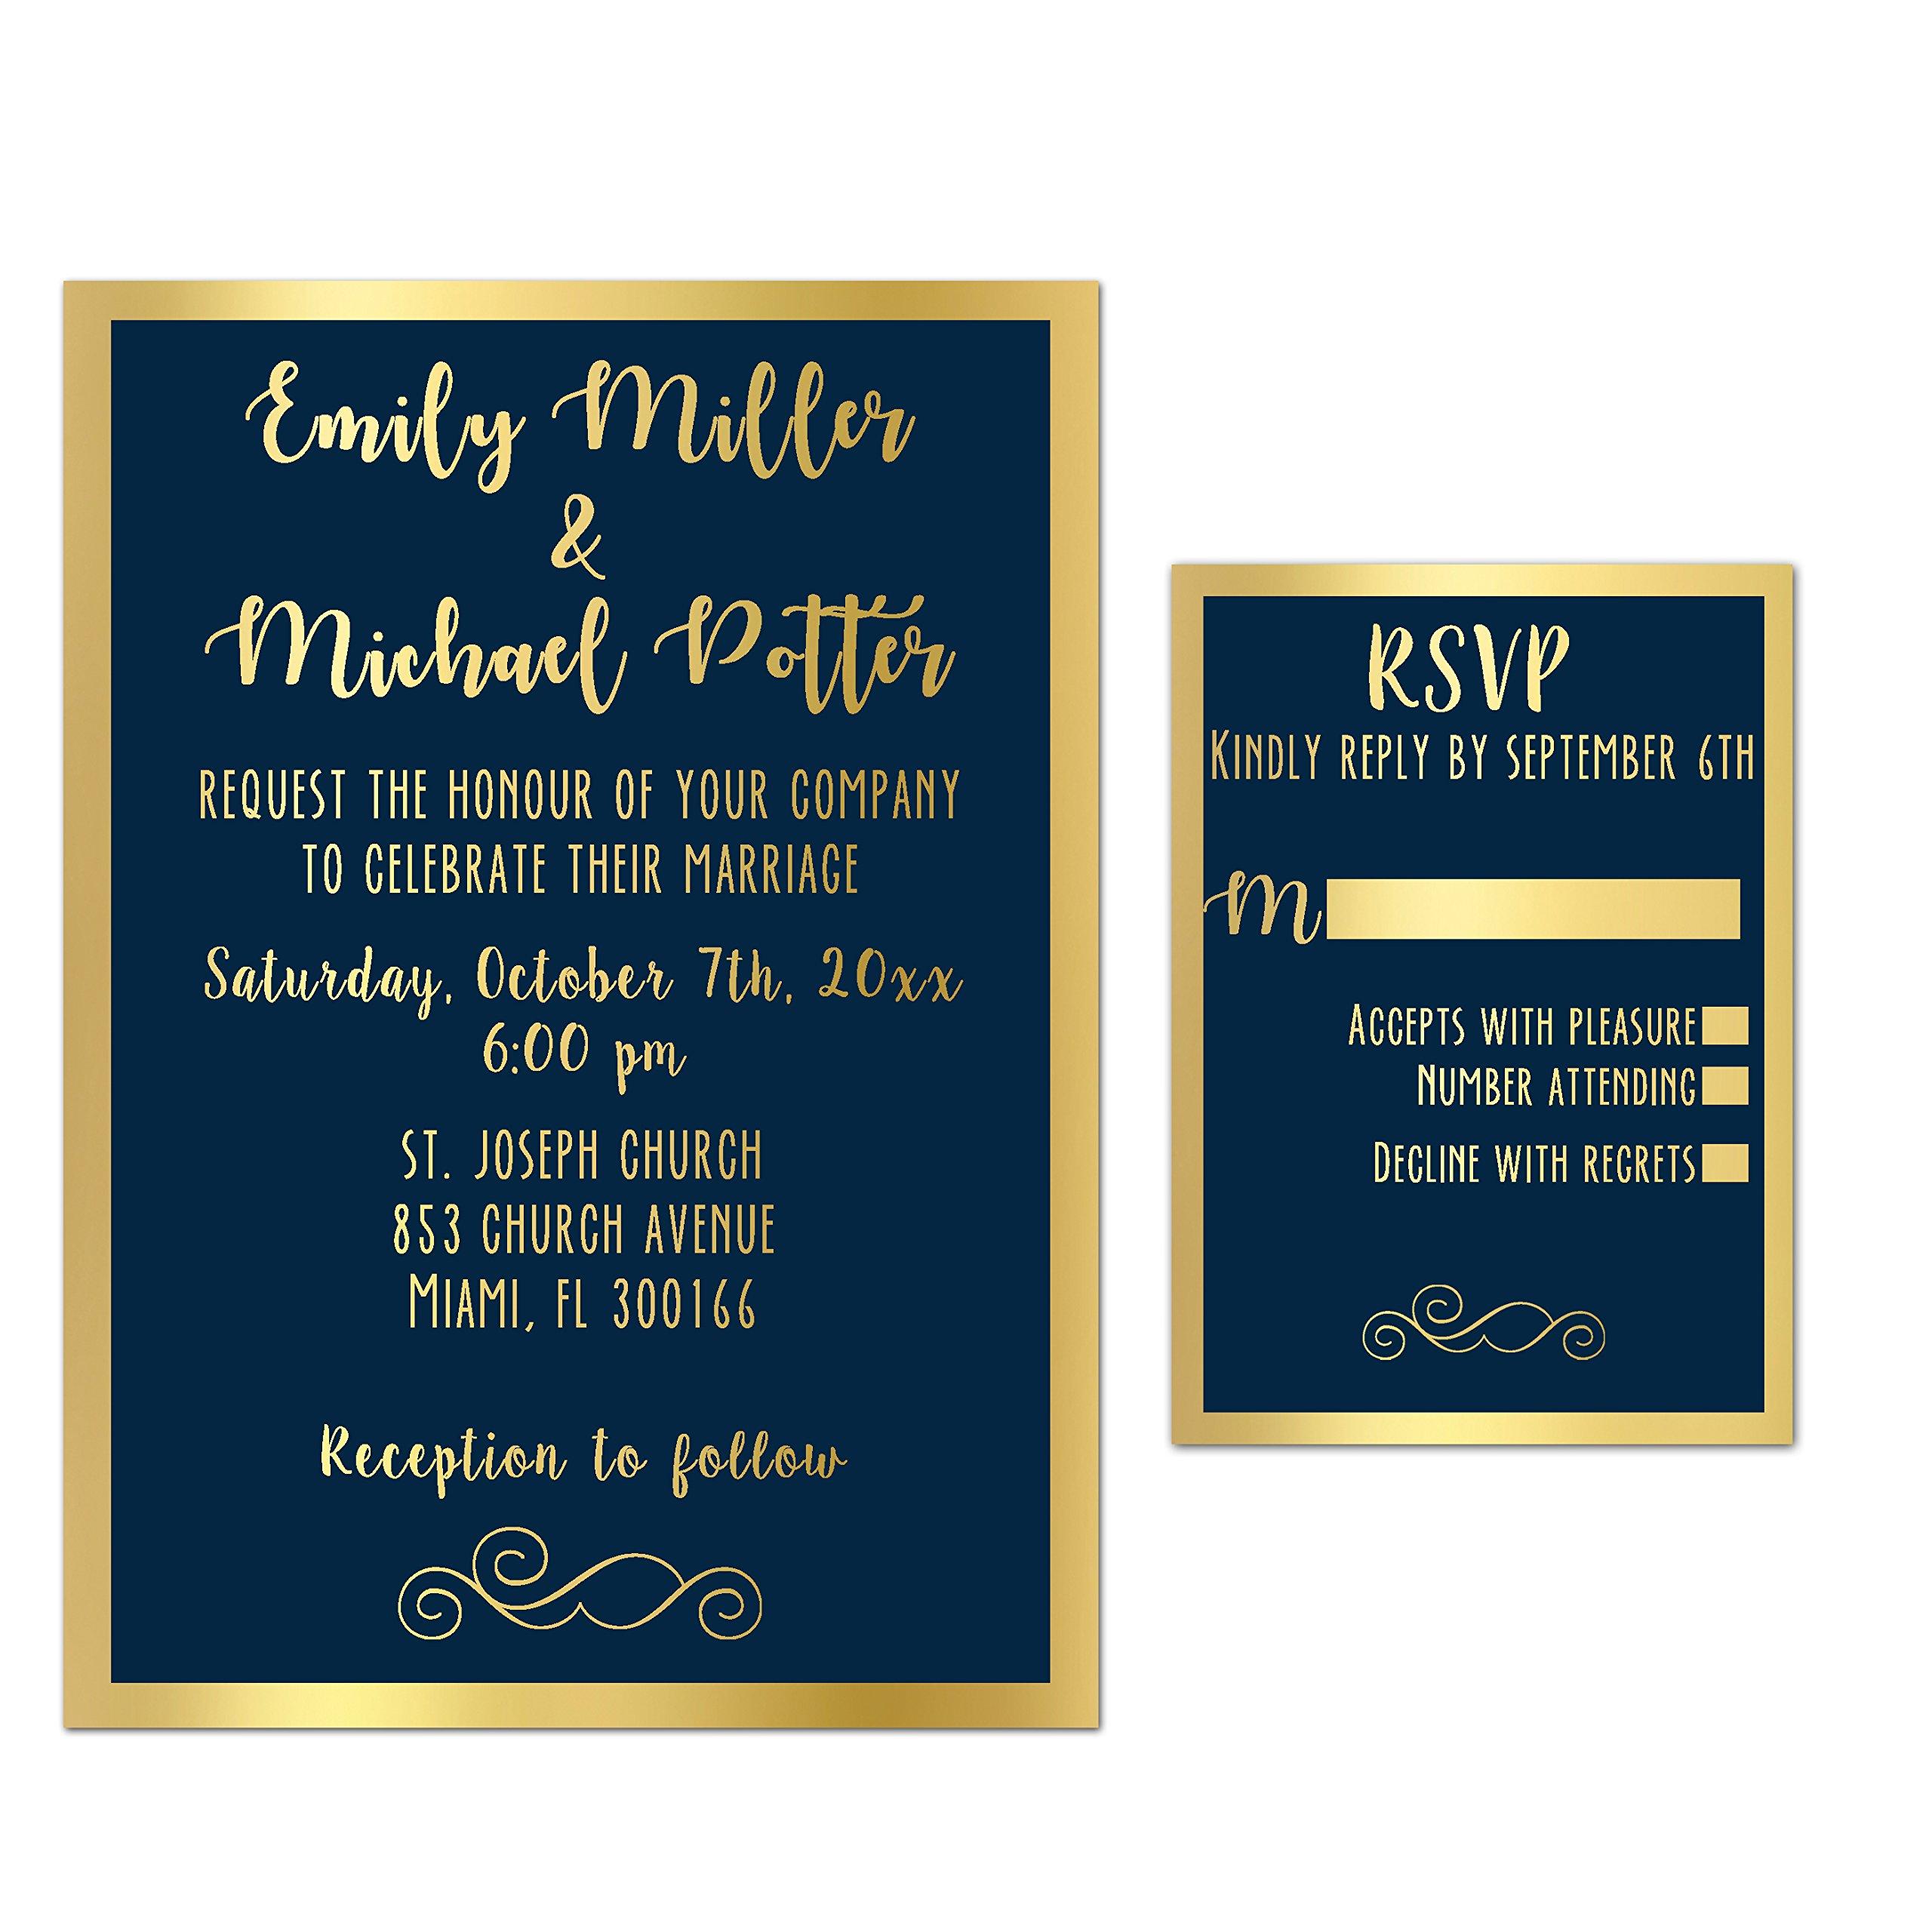 100 Wedding Invitations Gold Navy Blue Elegant + Envelopes + Response Cards Set